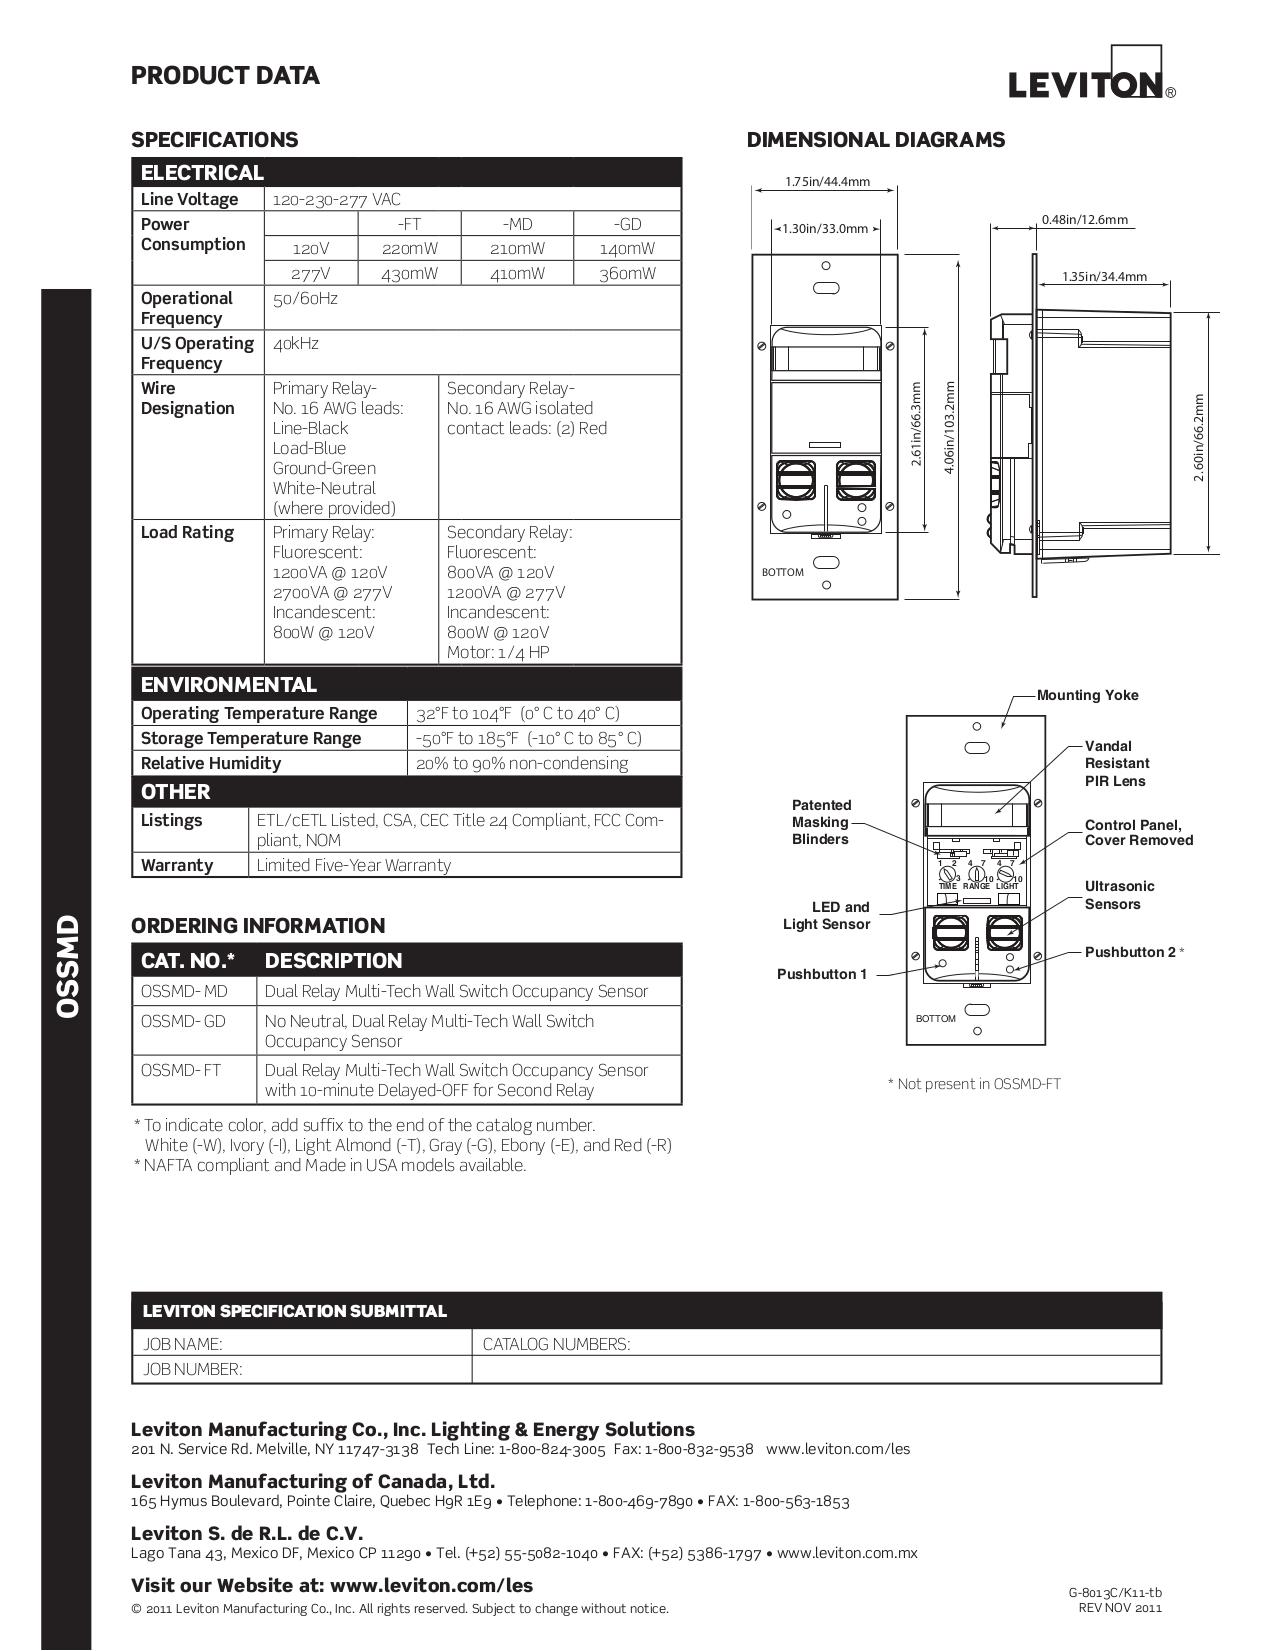 Charmant Leviton Katalog Pdf Bilder - Schaltplan Serie Circuit ...